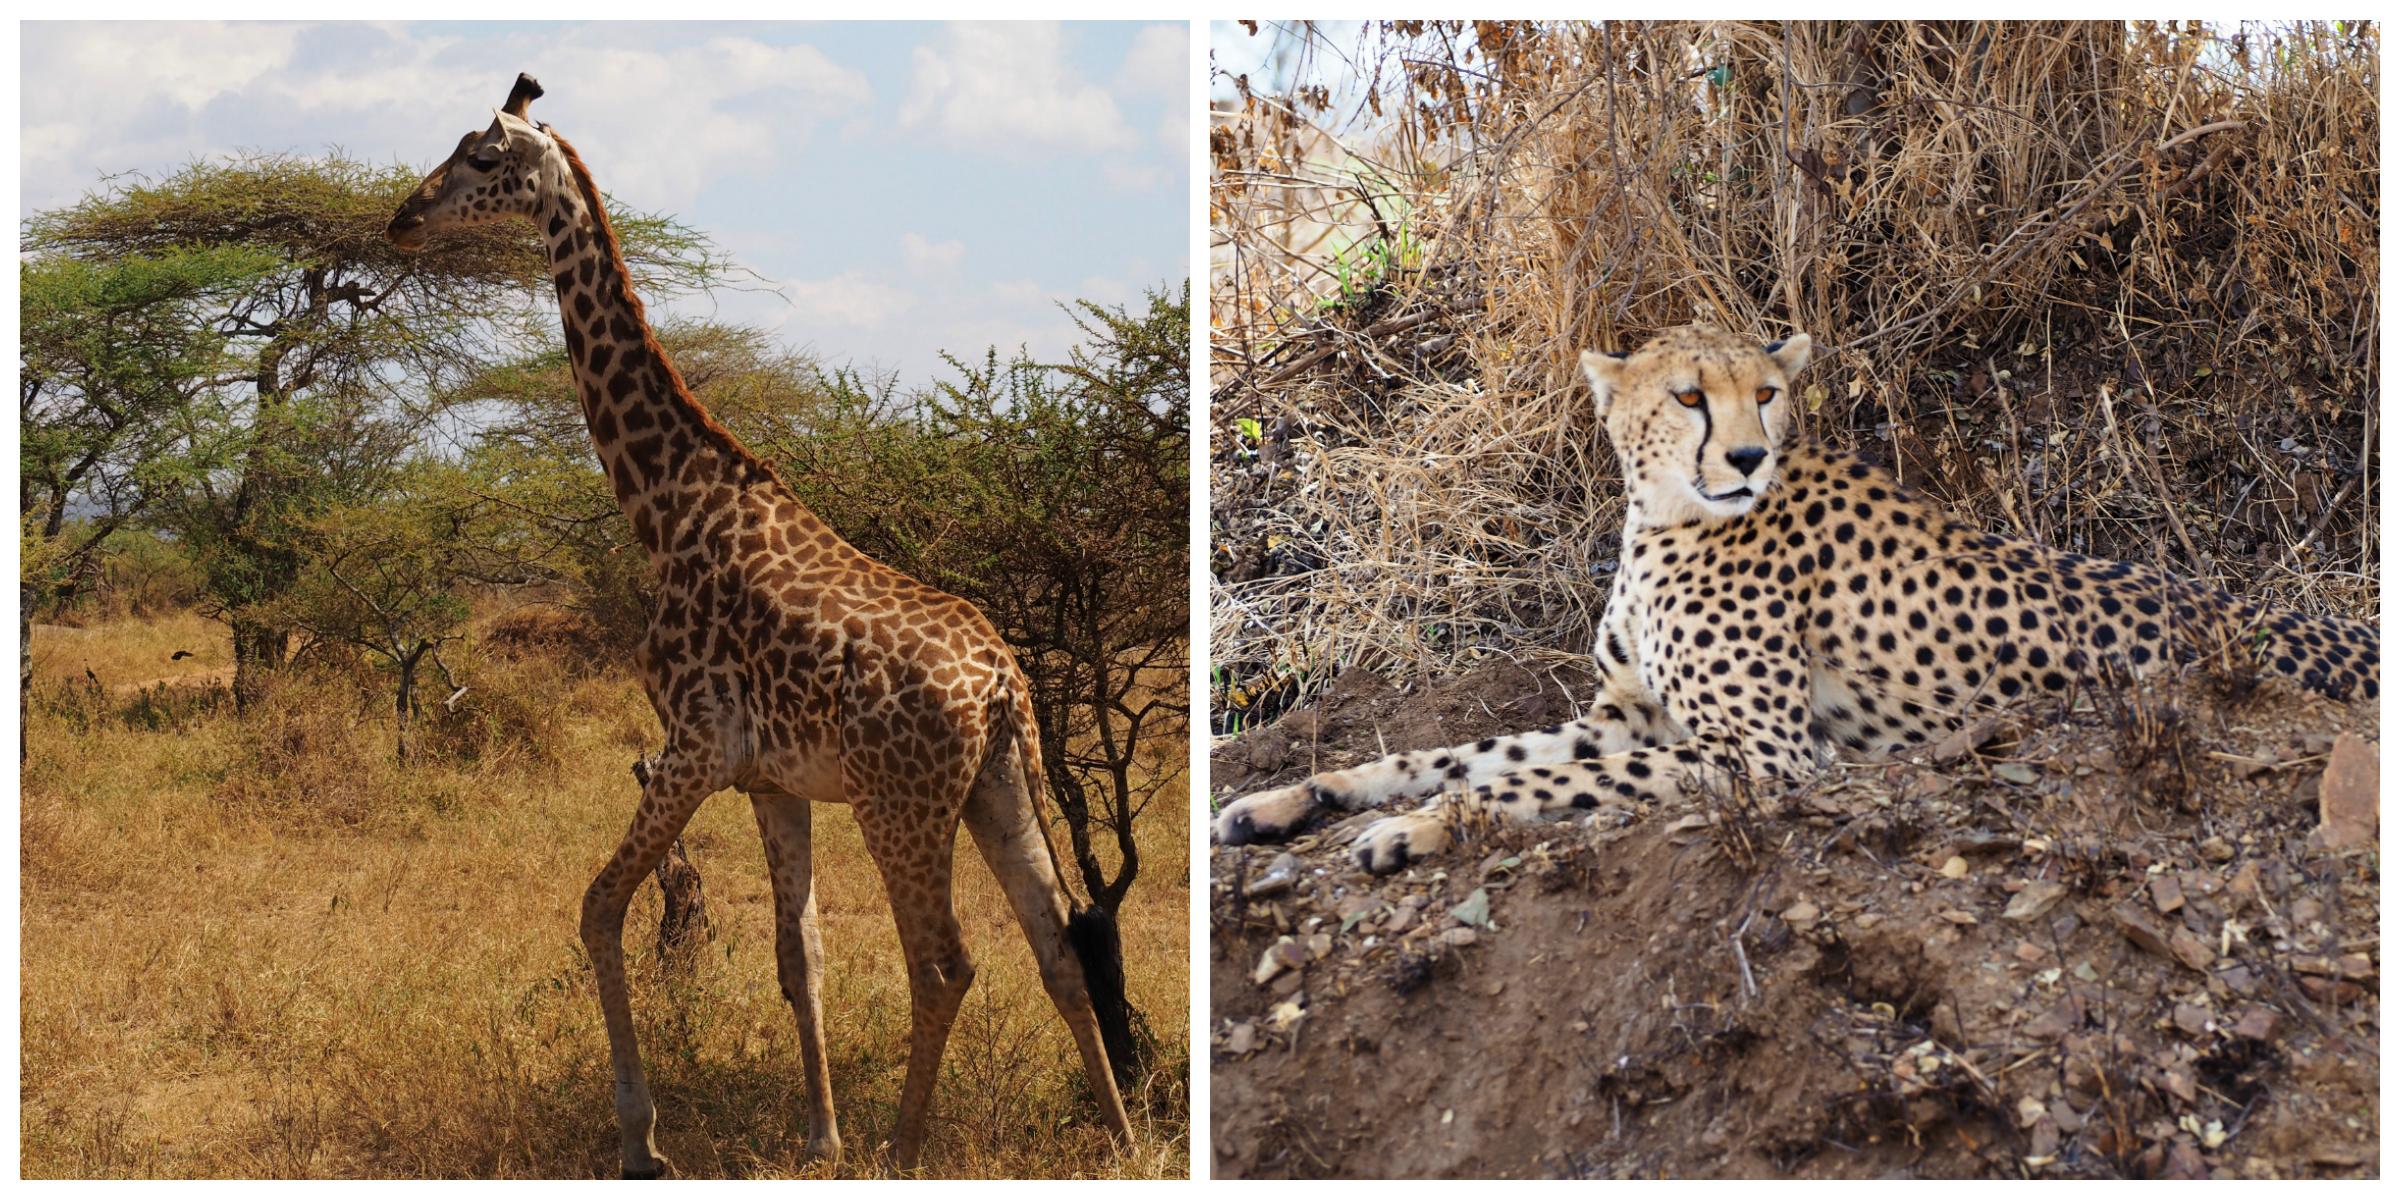 Giraffe | Cheetah